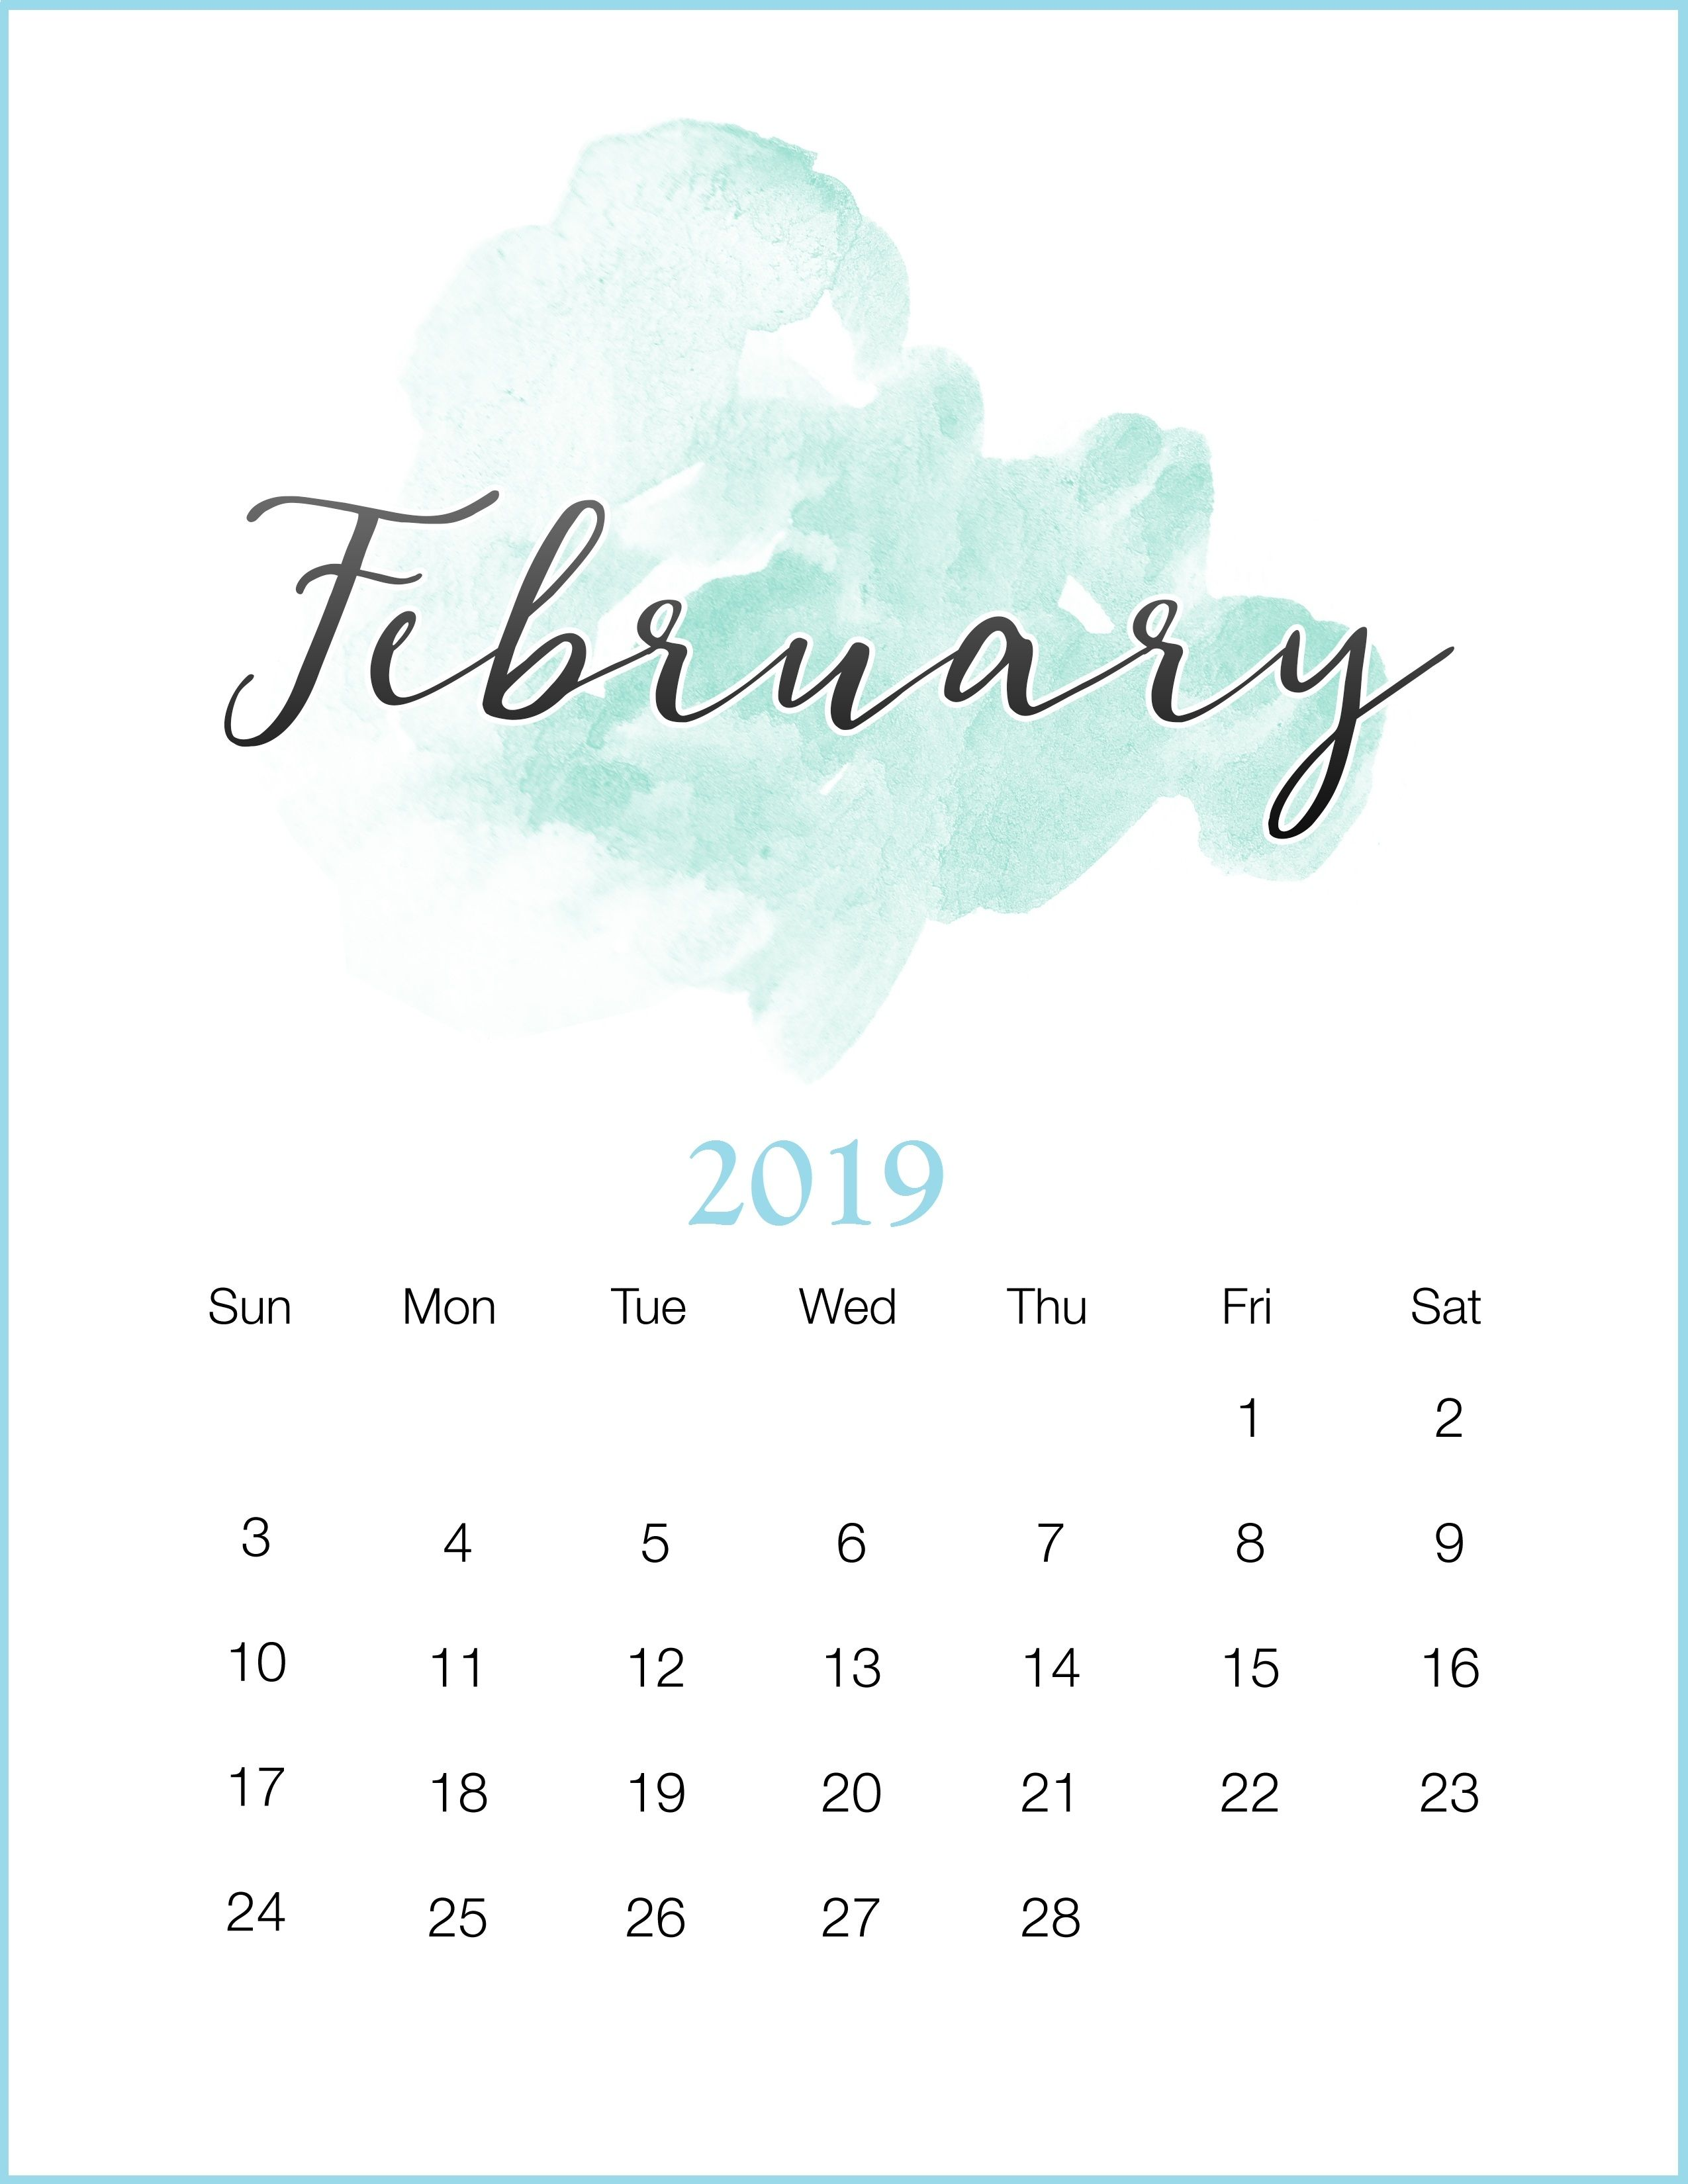 February March Editable Calendar 2019 free template february 2019 editable calendar march 2019